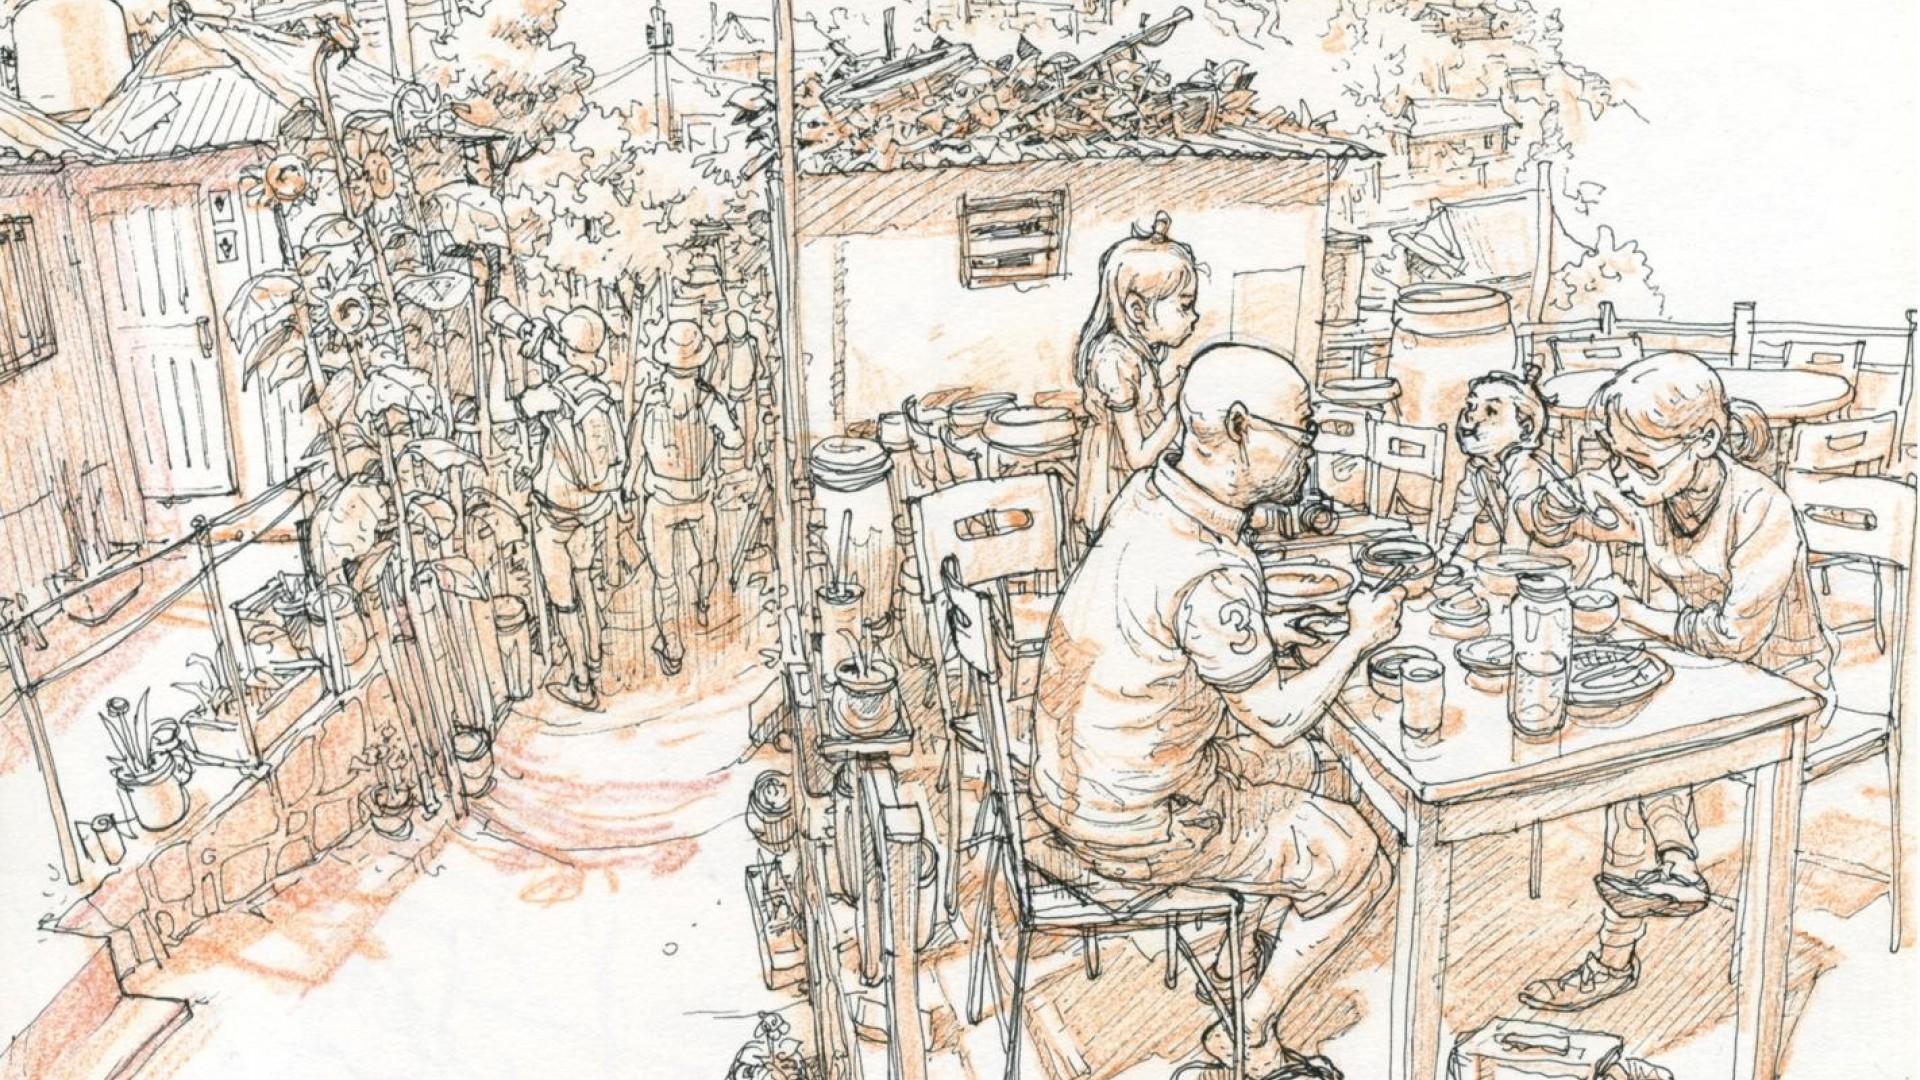 people-korean-monochrome-artwork-drawings-kim-jung-gi-1920x1080-1920×1080-wallpaper-wpc9207919